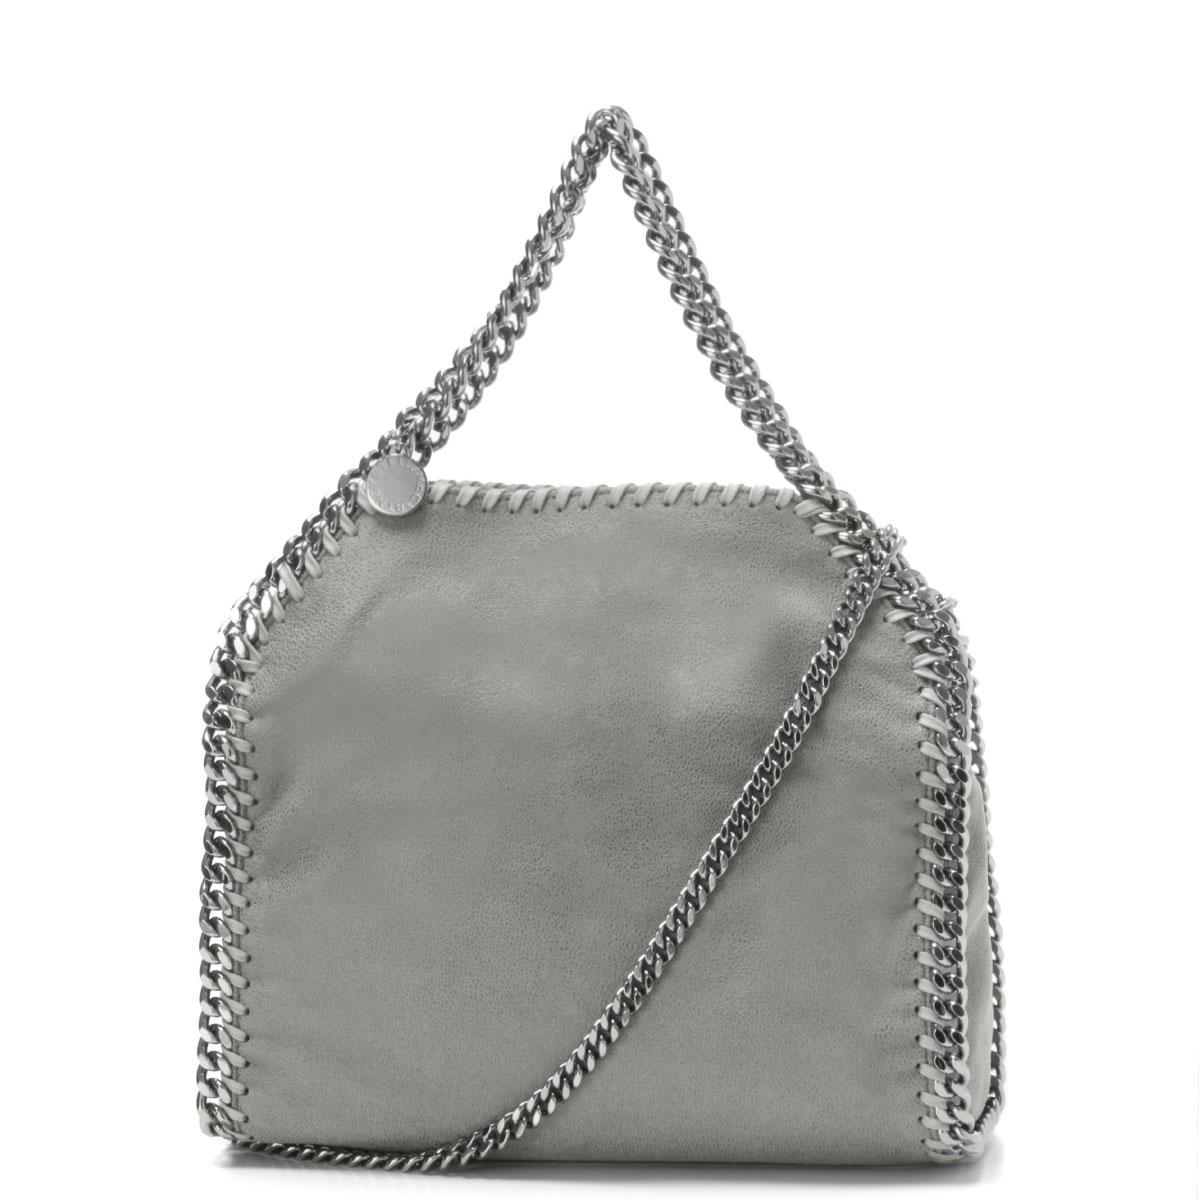 STELLAMCCARTNEY (Stella McCartney) bag tote bag mini GREY grey FALABELLA  FALABELLA GREY e91e517660acc